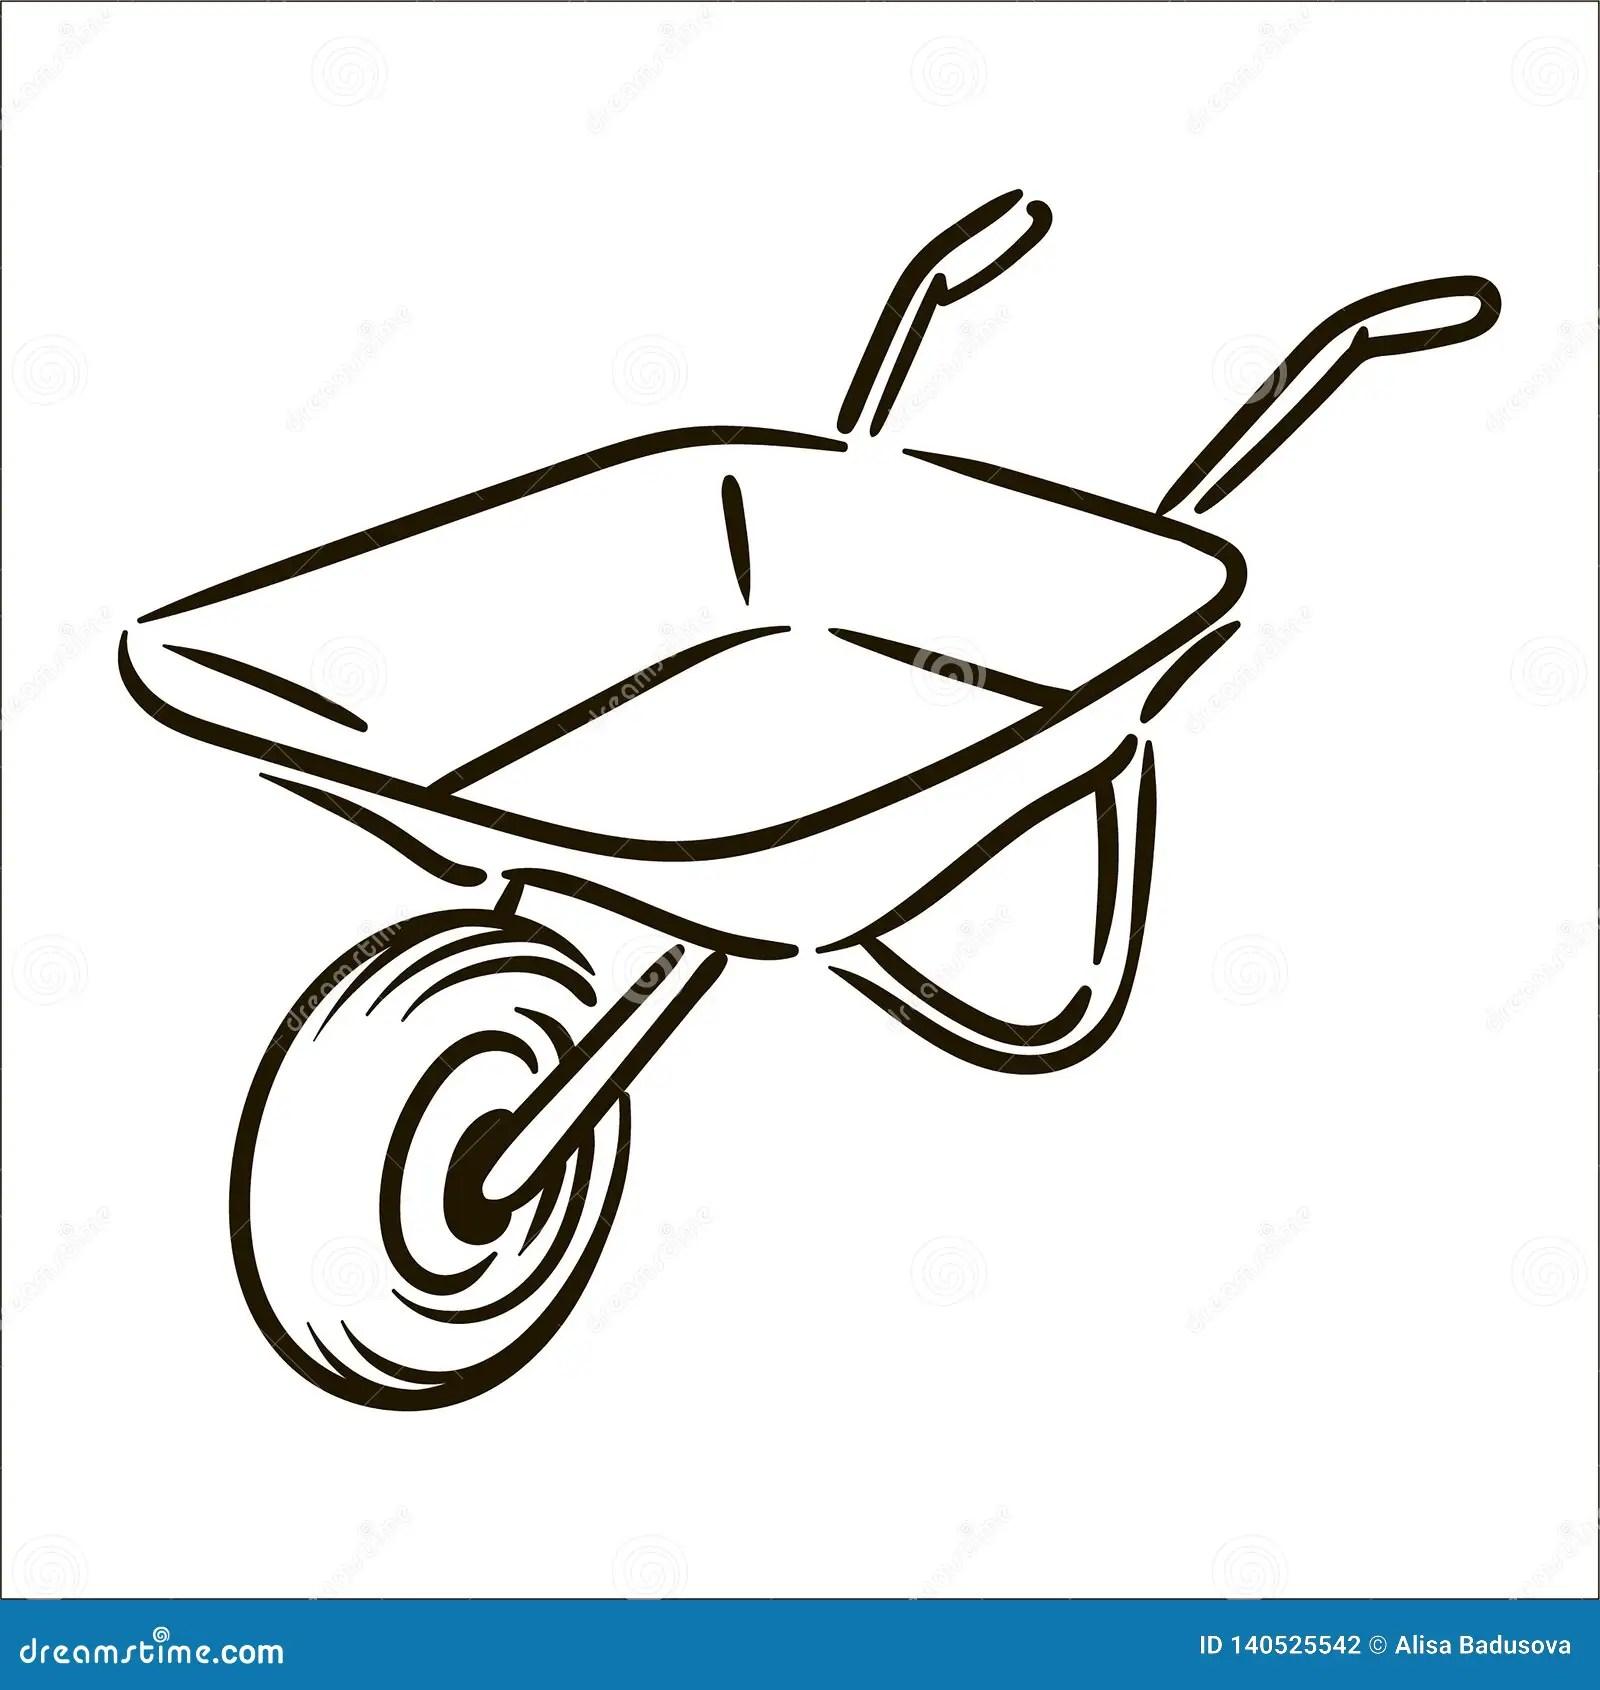 pics How To Draw A Simple Wheelbarrow https www dreamstime com vector hand drawn farm wheelbarrow simple sketch illustration vector hand drawn farm wheelbarrow simple sketch illustration image140525542